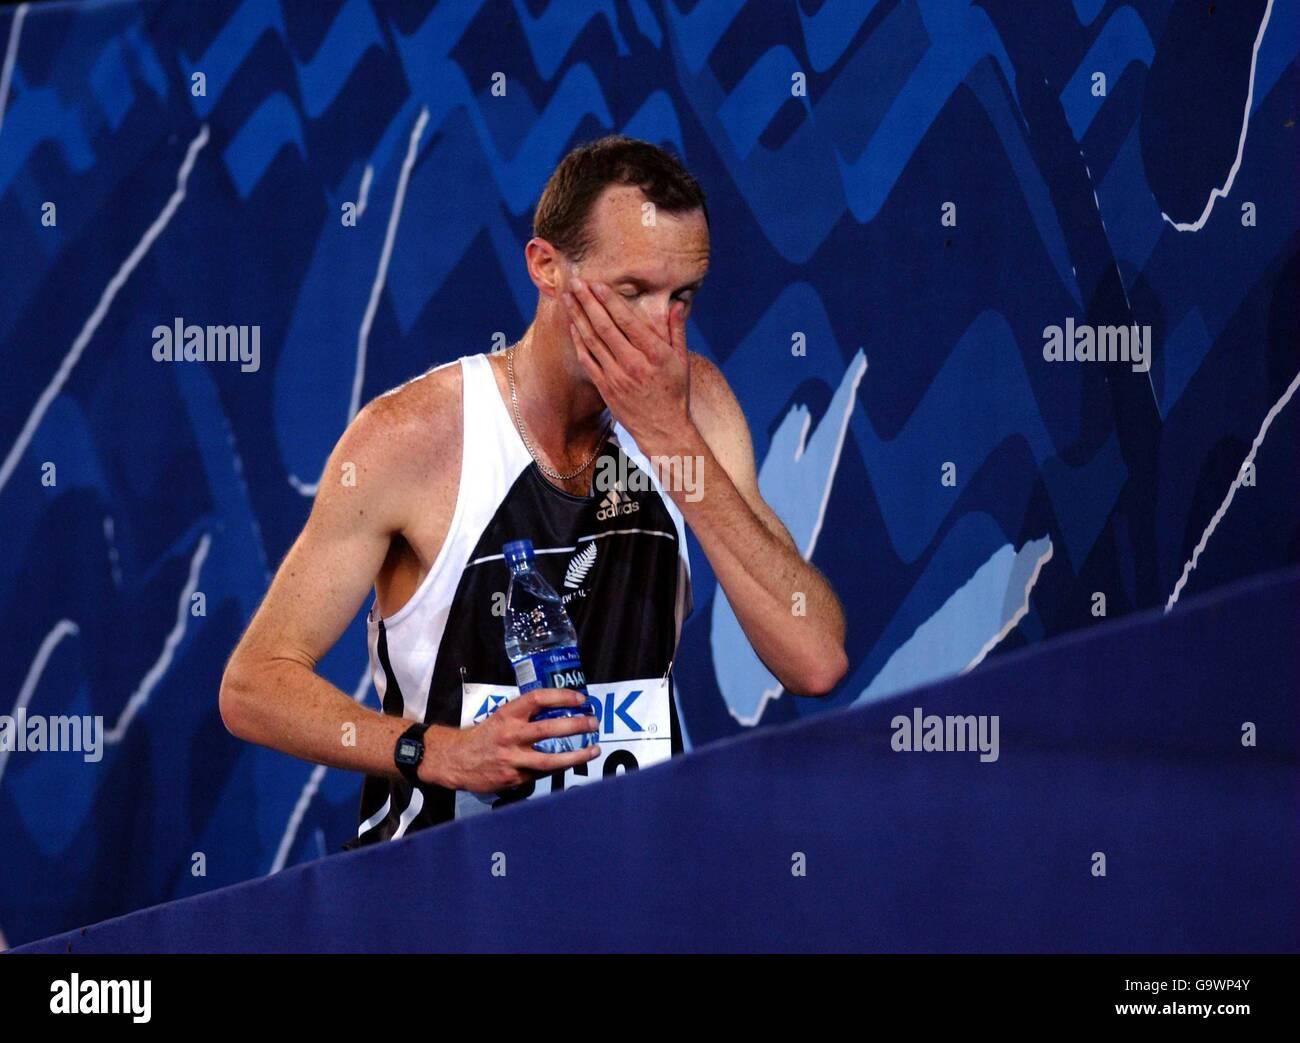 Athletics - IAAF World Championships - Edmonton - Stock Image